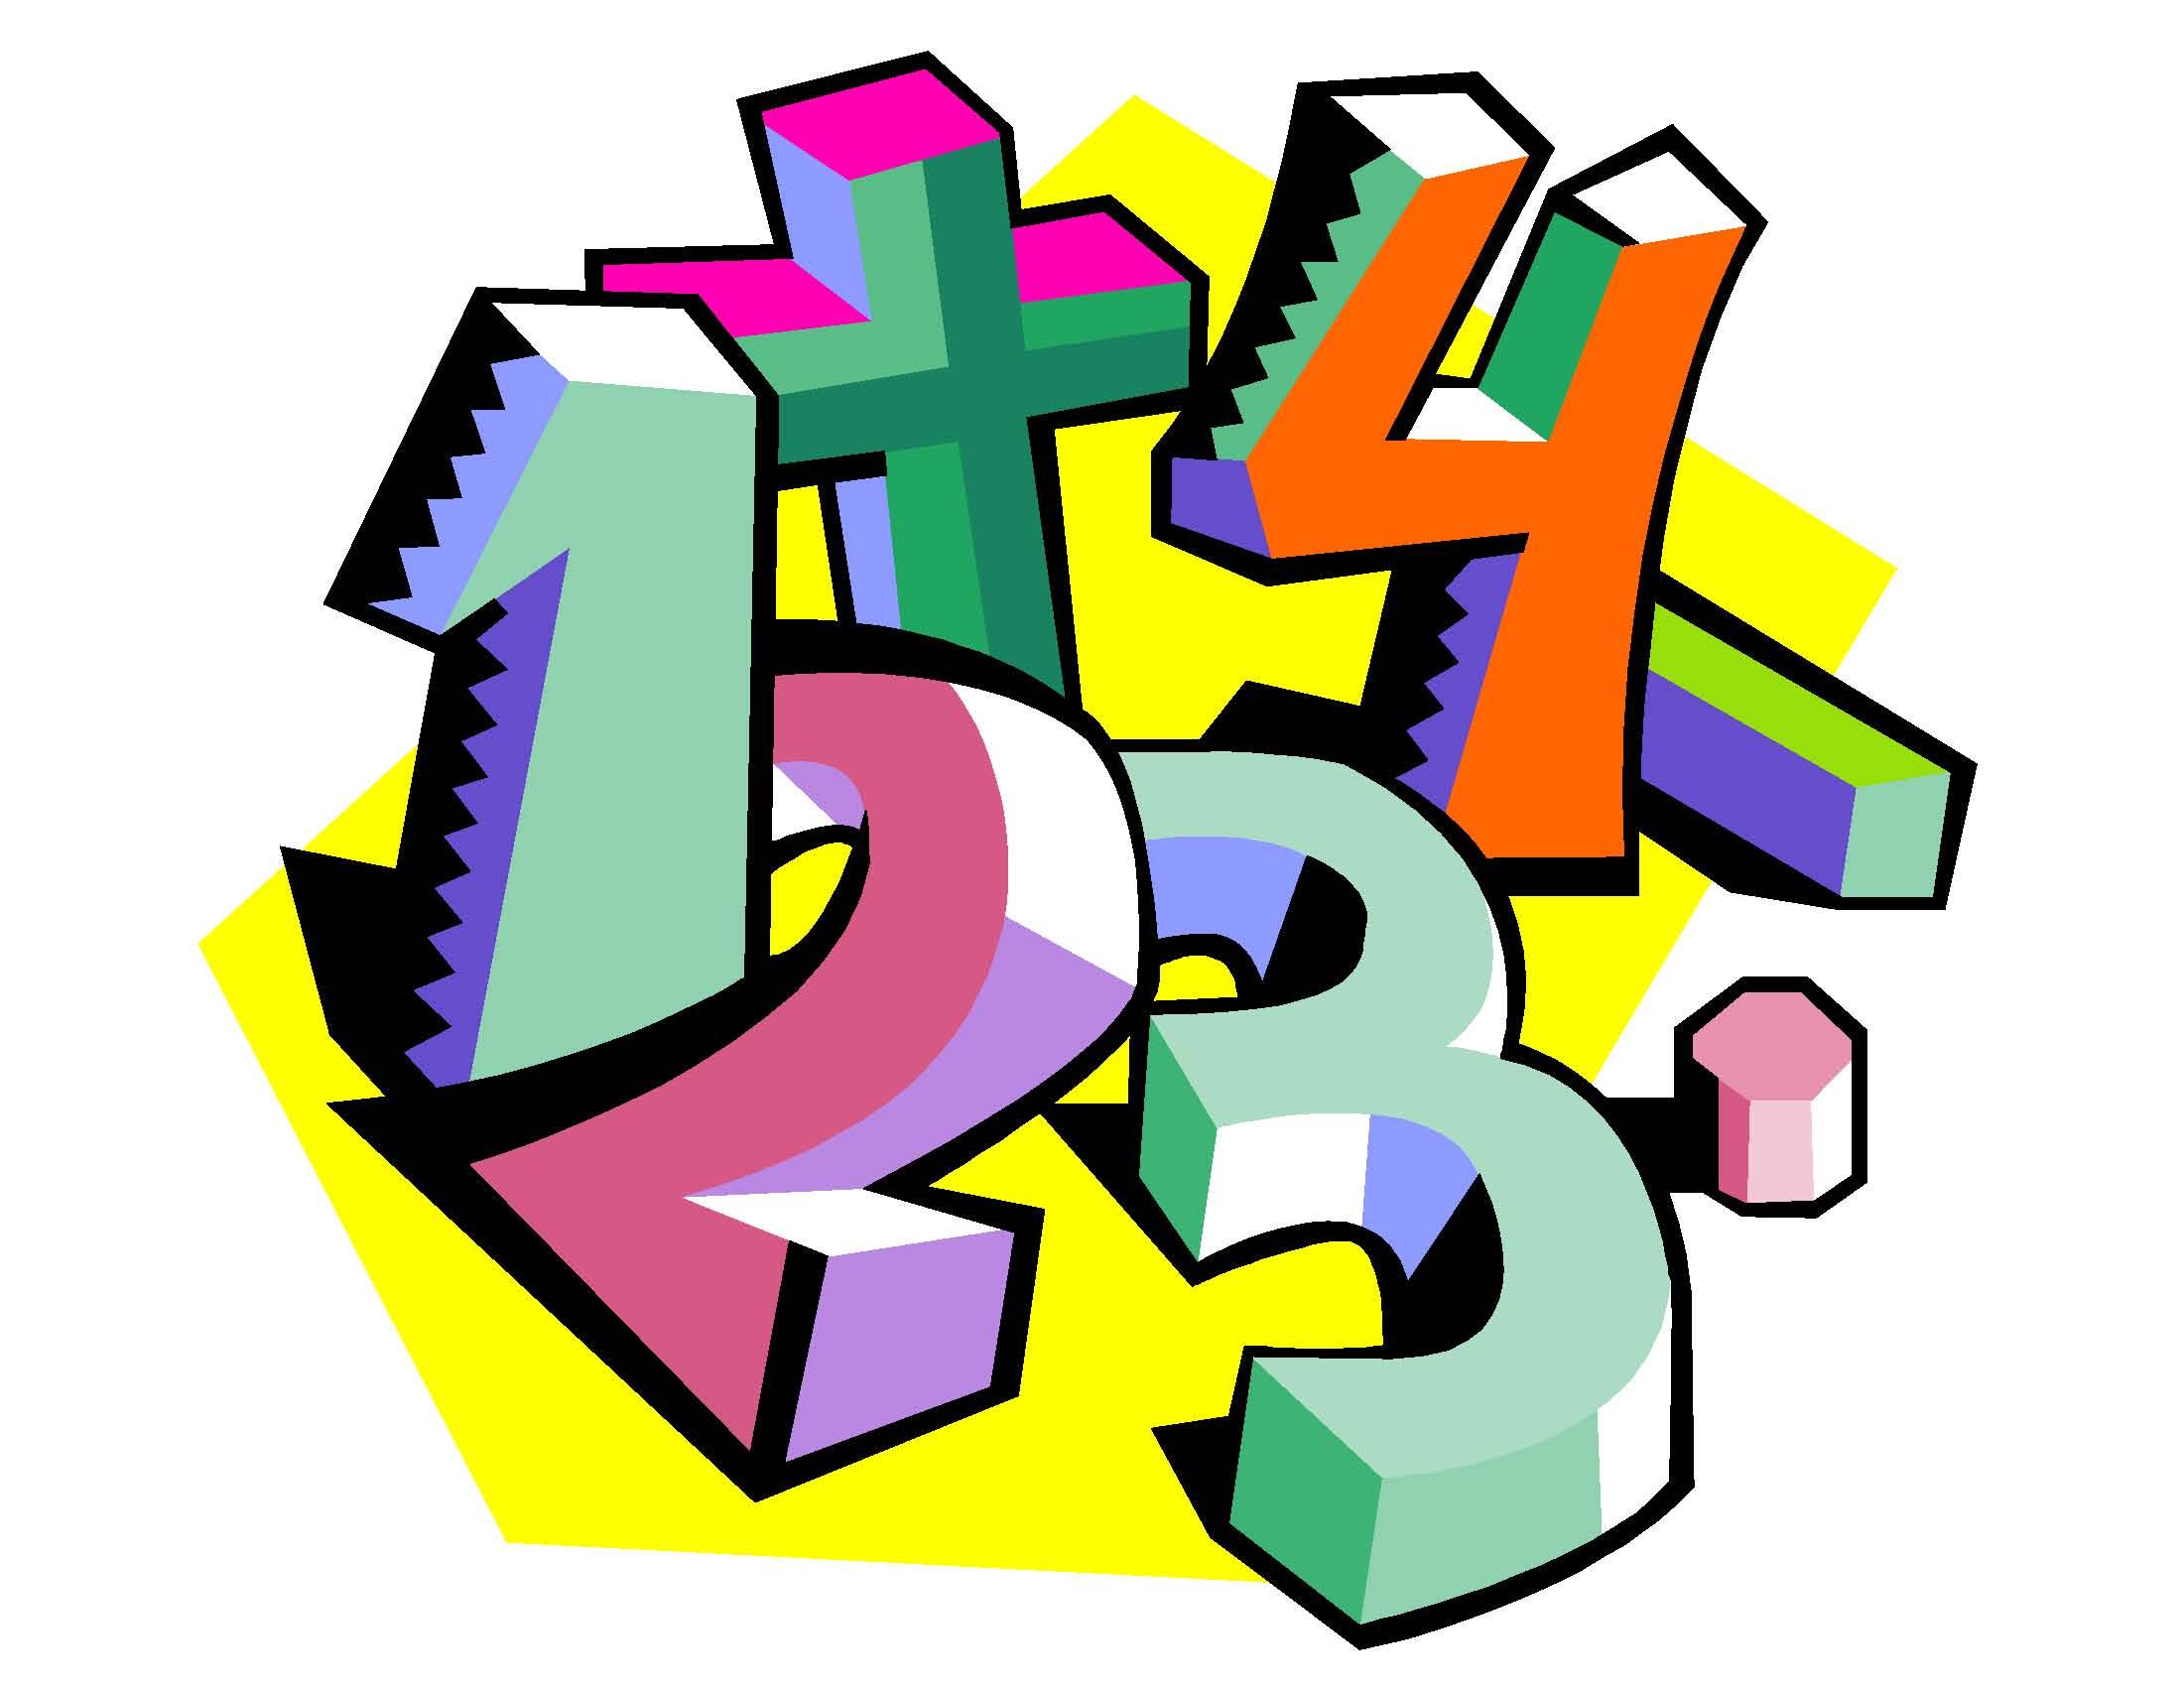 Картинки на тему математики для детей